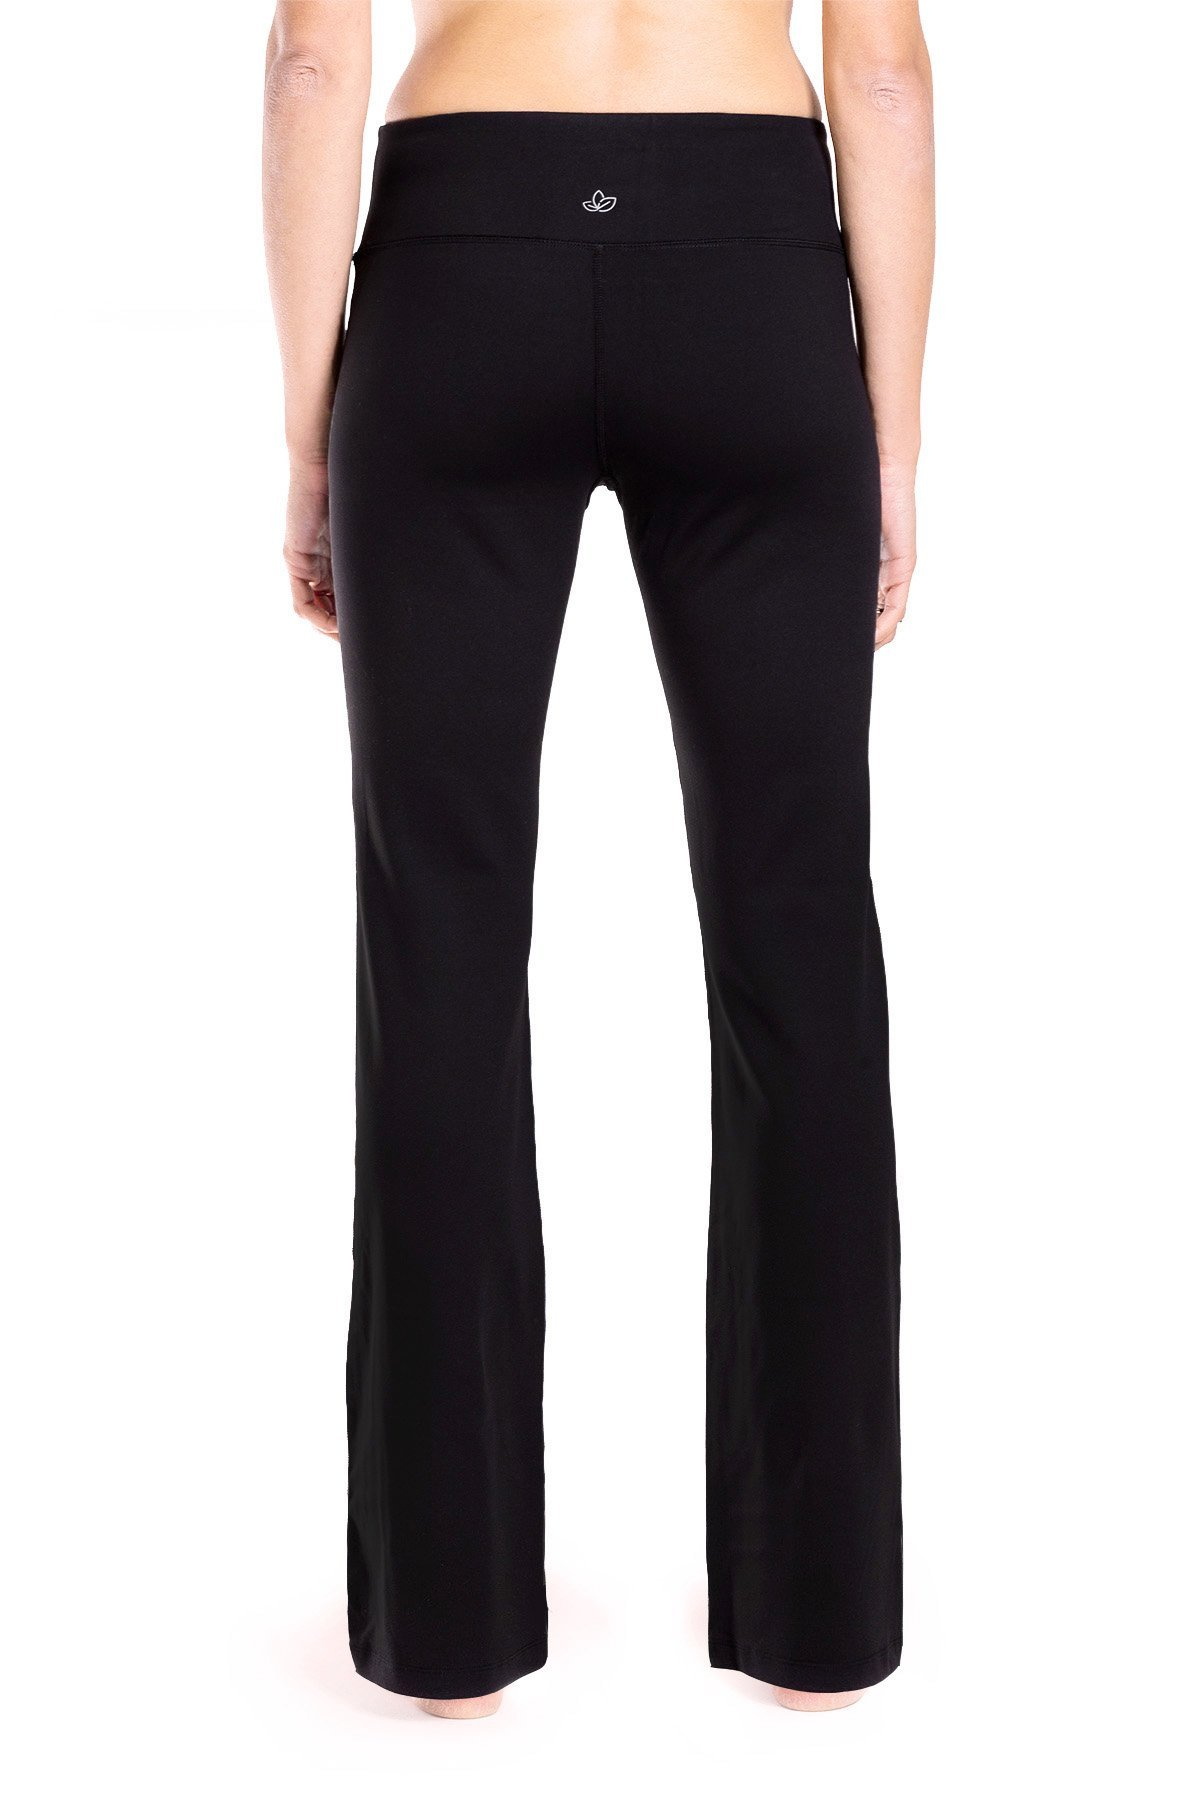 Yogipace 27''/28''/29''/30''/31''/32''/33''/35''/37'' Inseam,Petite/Regular/Tall, Women's Bootcut Yoga Pants Long Workout Pants, 28'', Black Size XXL by Yogipace (Image #5)